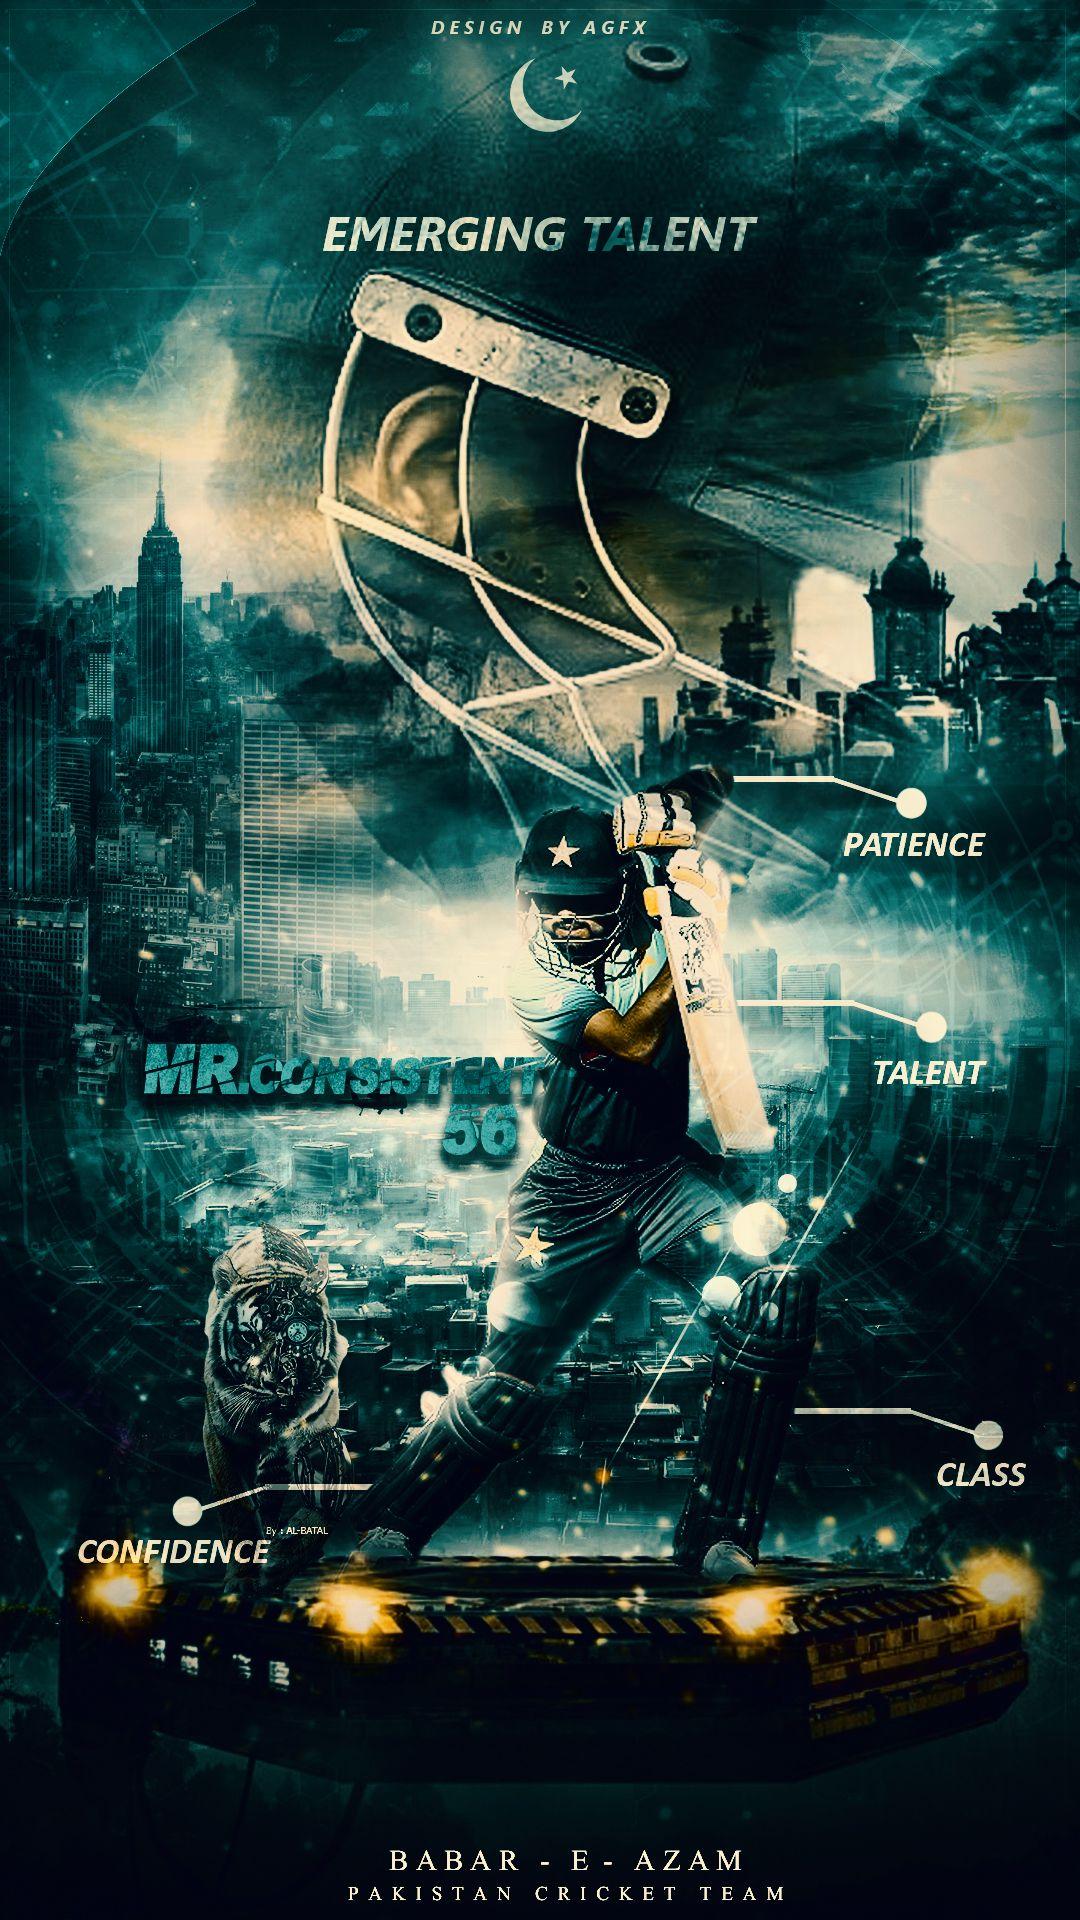 Cricket | Babar Azam | PSL - Wallpaper #PSL #Wallpaper #edit #photoshop #Cricket #icc #ct #pakistan #art #artist #editing #photoedit #wallpaper ...